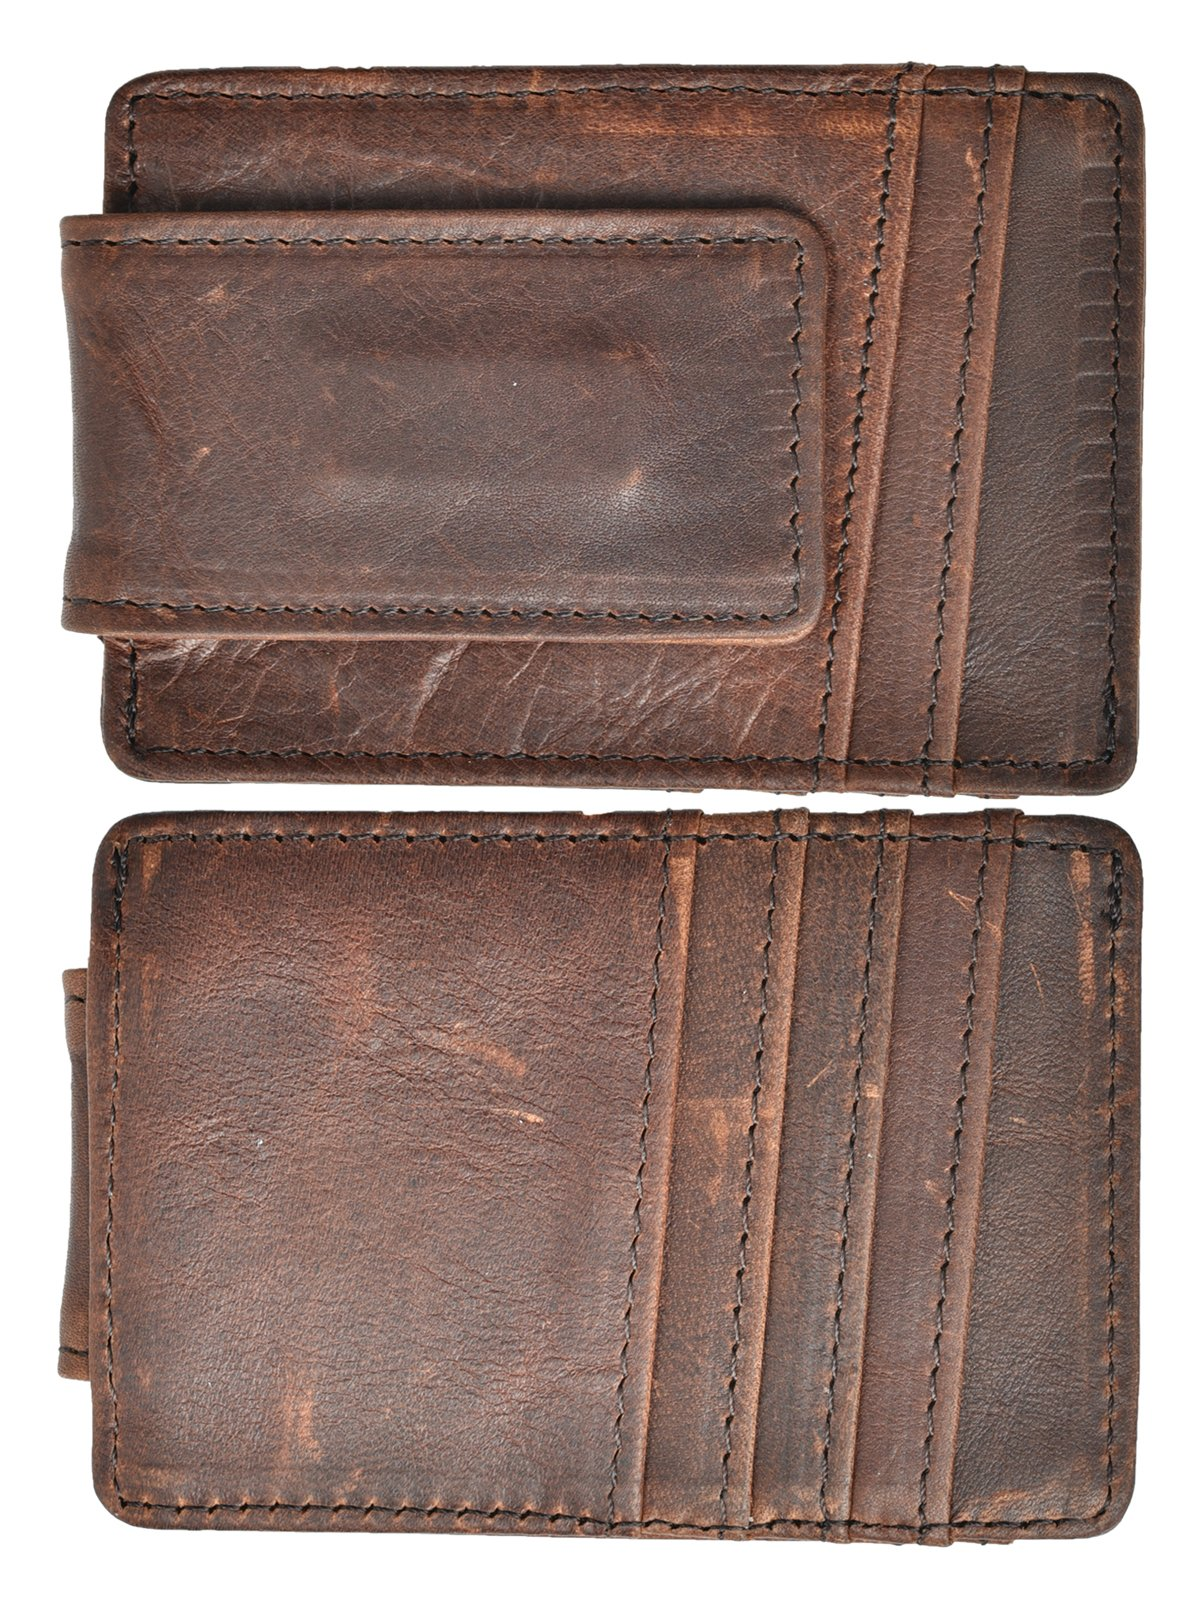 Hopsooken Money Clip RFID Front Pocket Wallet Men Leather Slim Minimalist Wallet (Deep Brown)